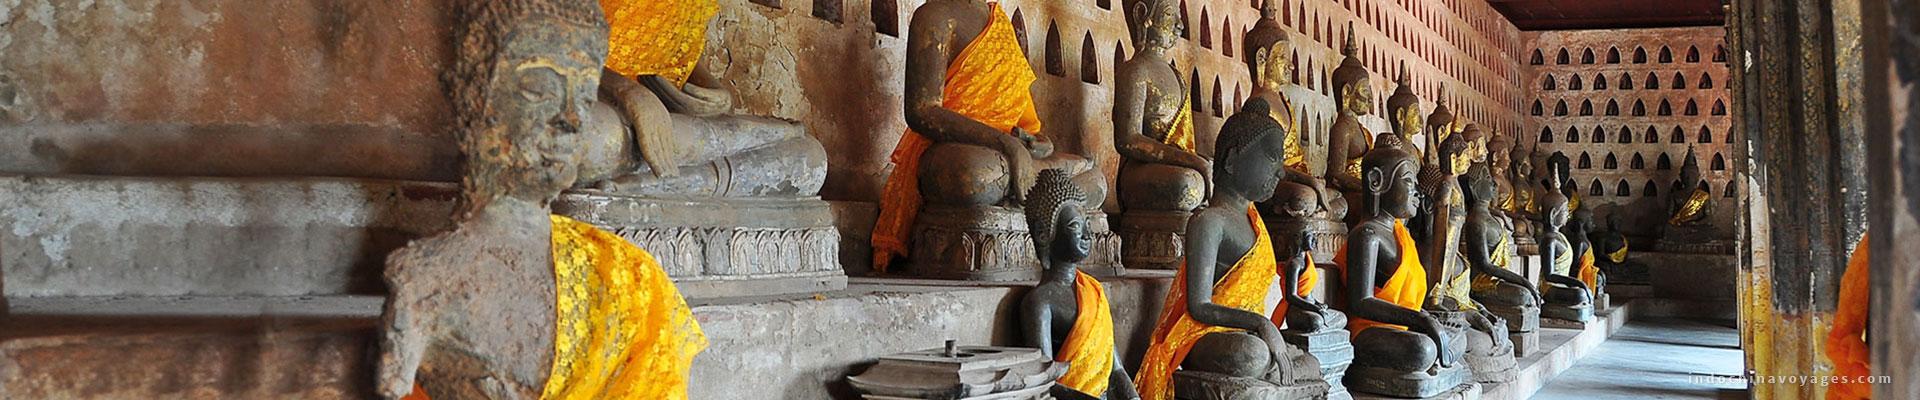 7 must-go travelers attractions in Vientiane, Laos